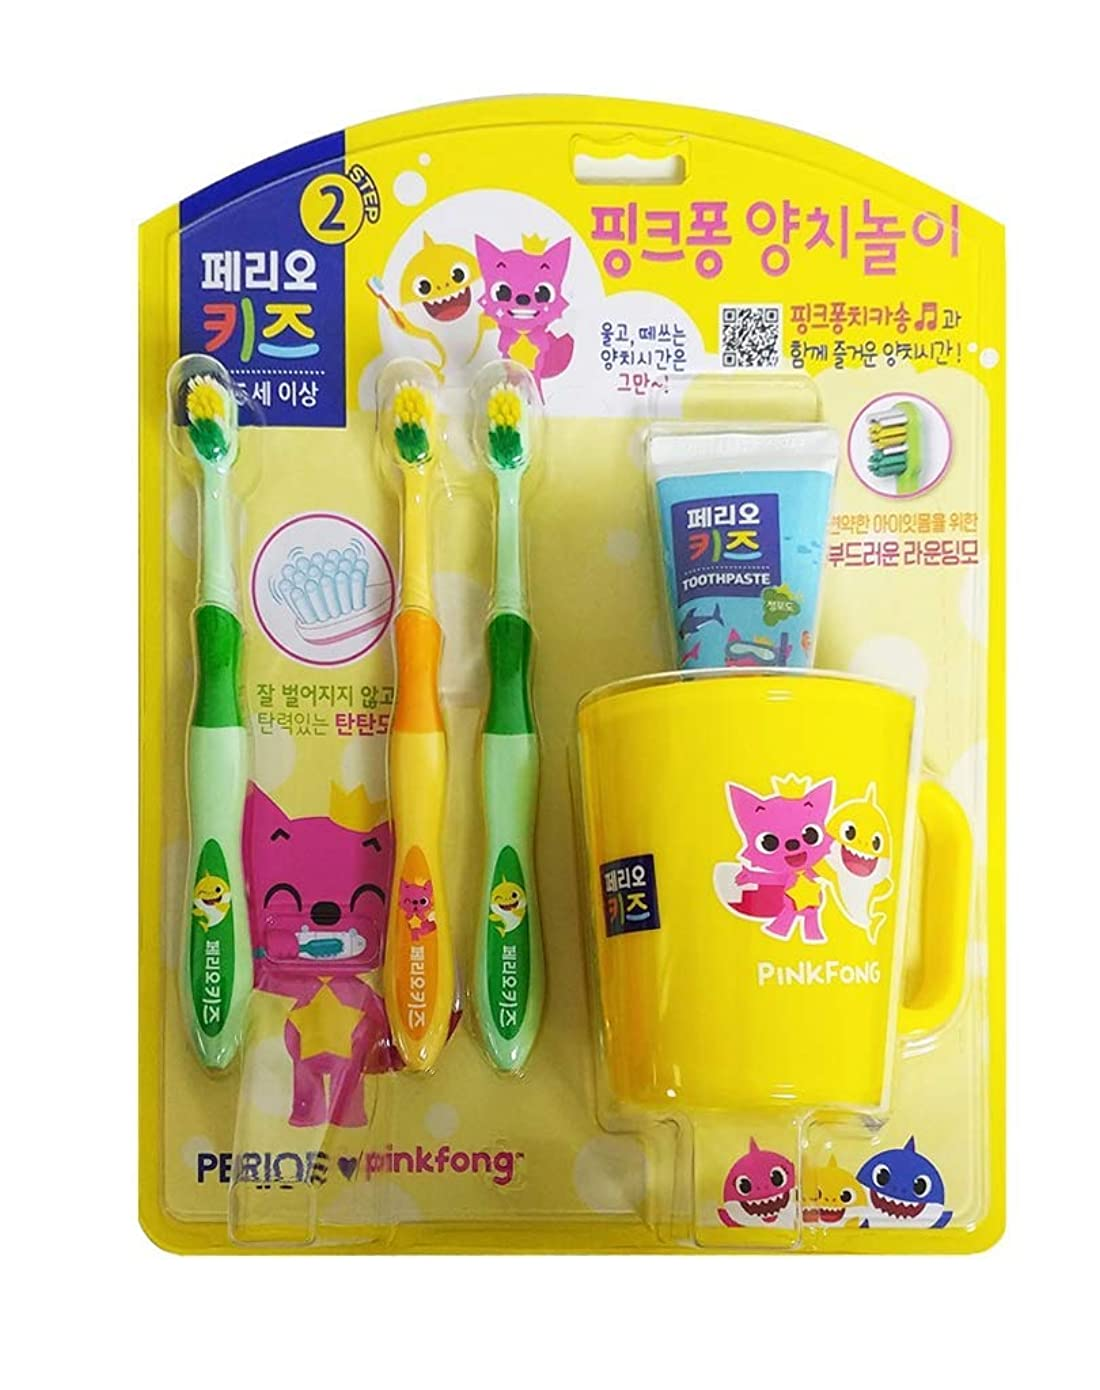 PINKFONG(ピンクポン,ピンクフォン) 子供用 歯ブラシ セット